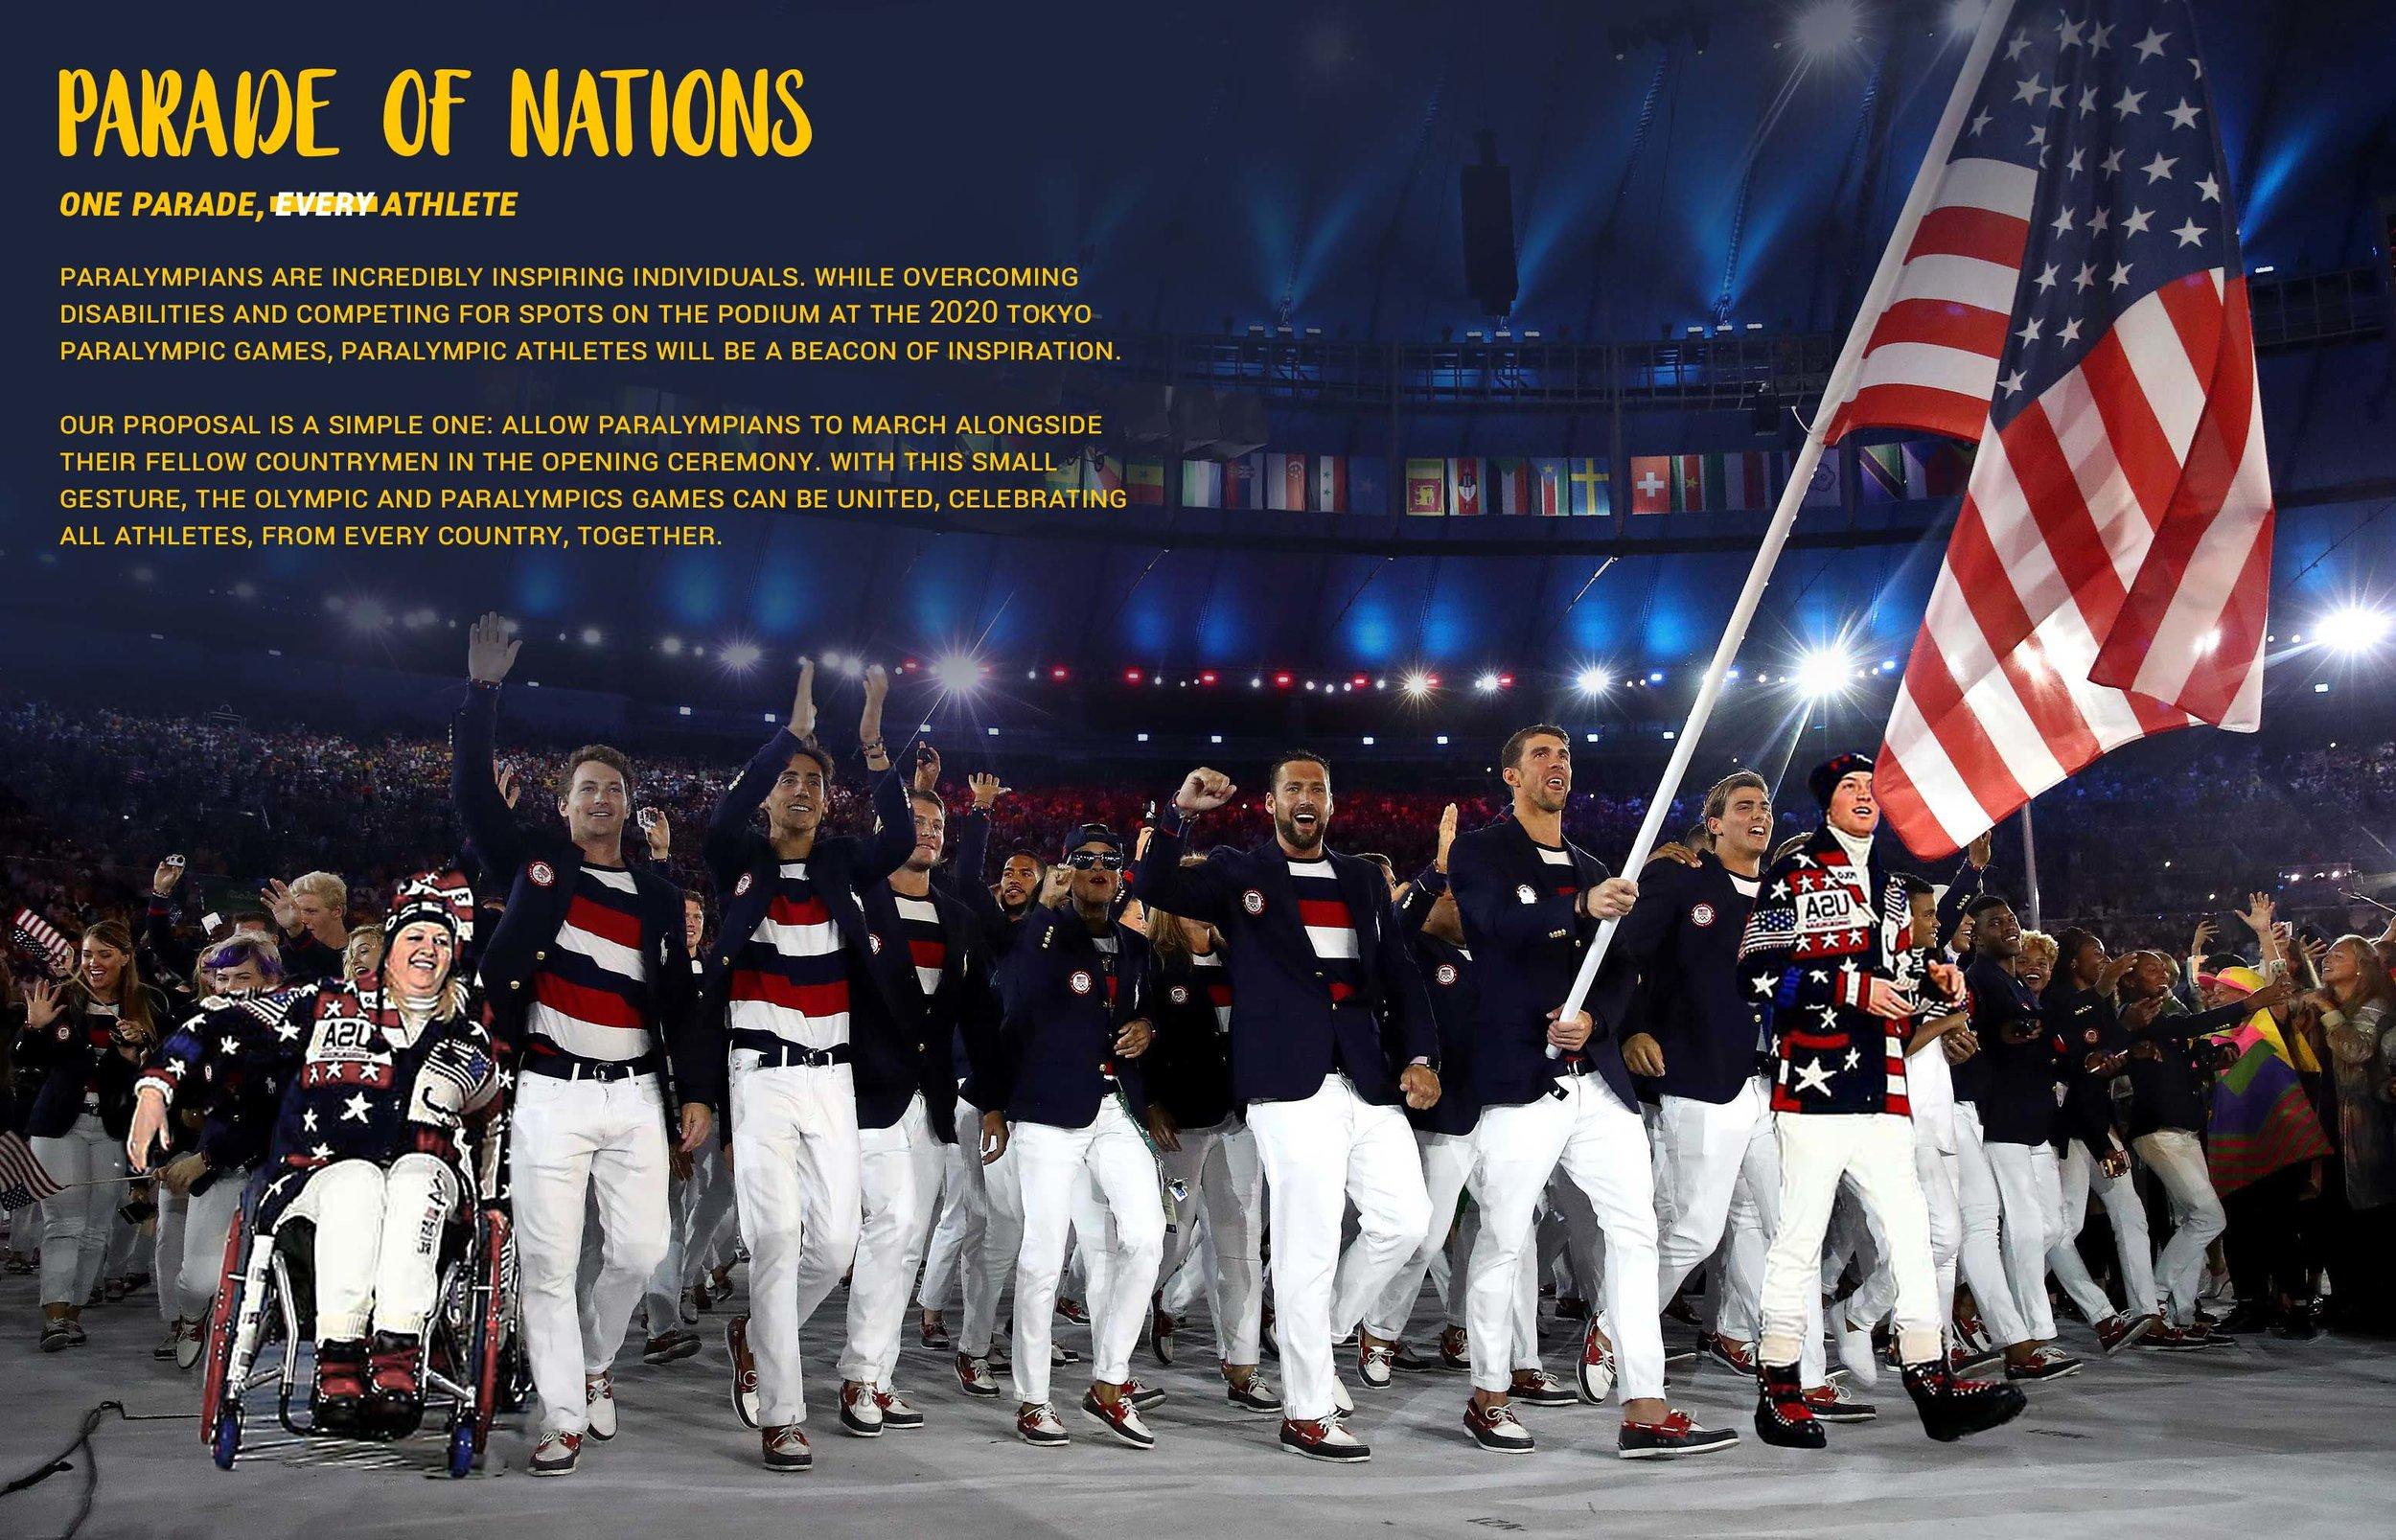 Parade of Nations Board.jpg